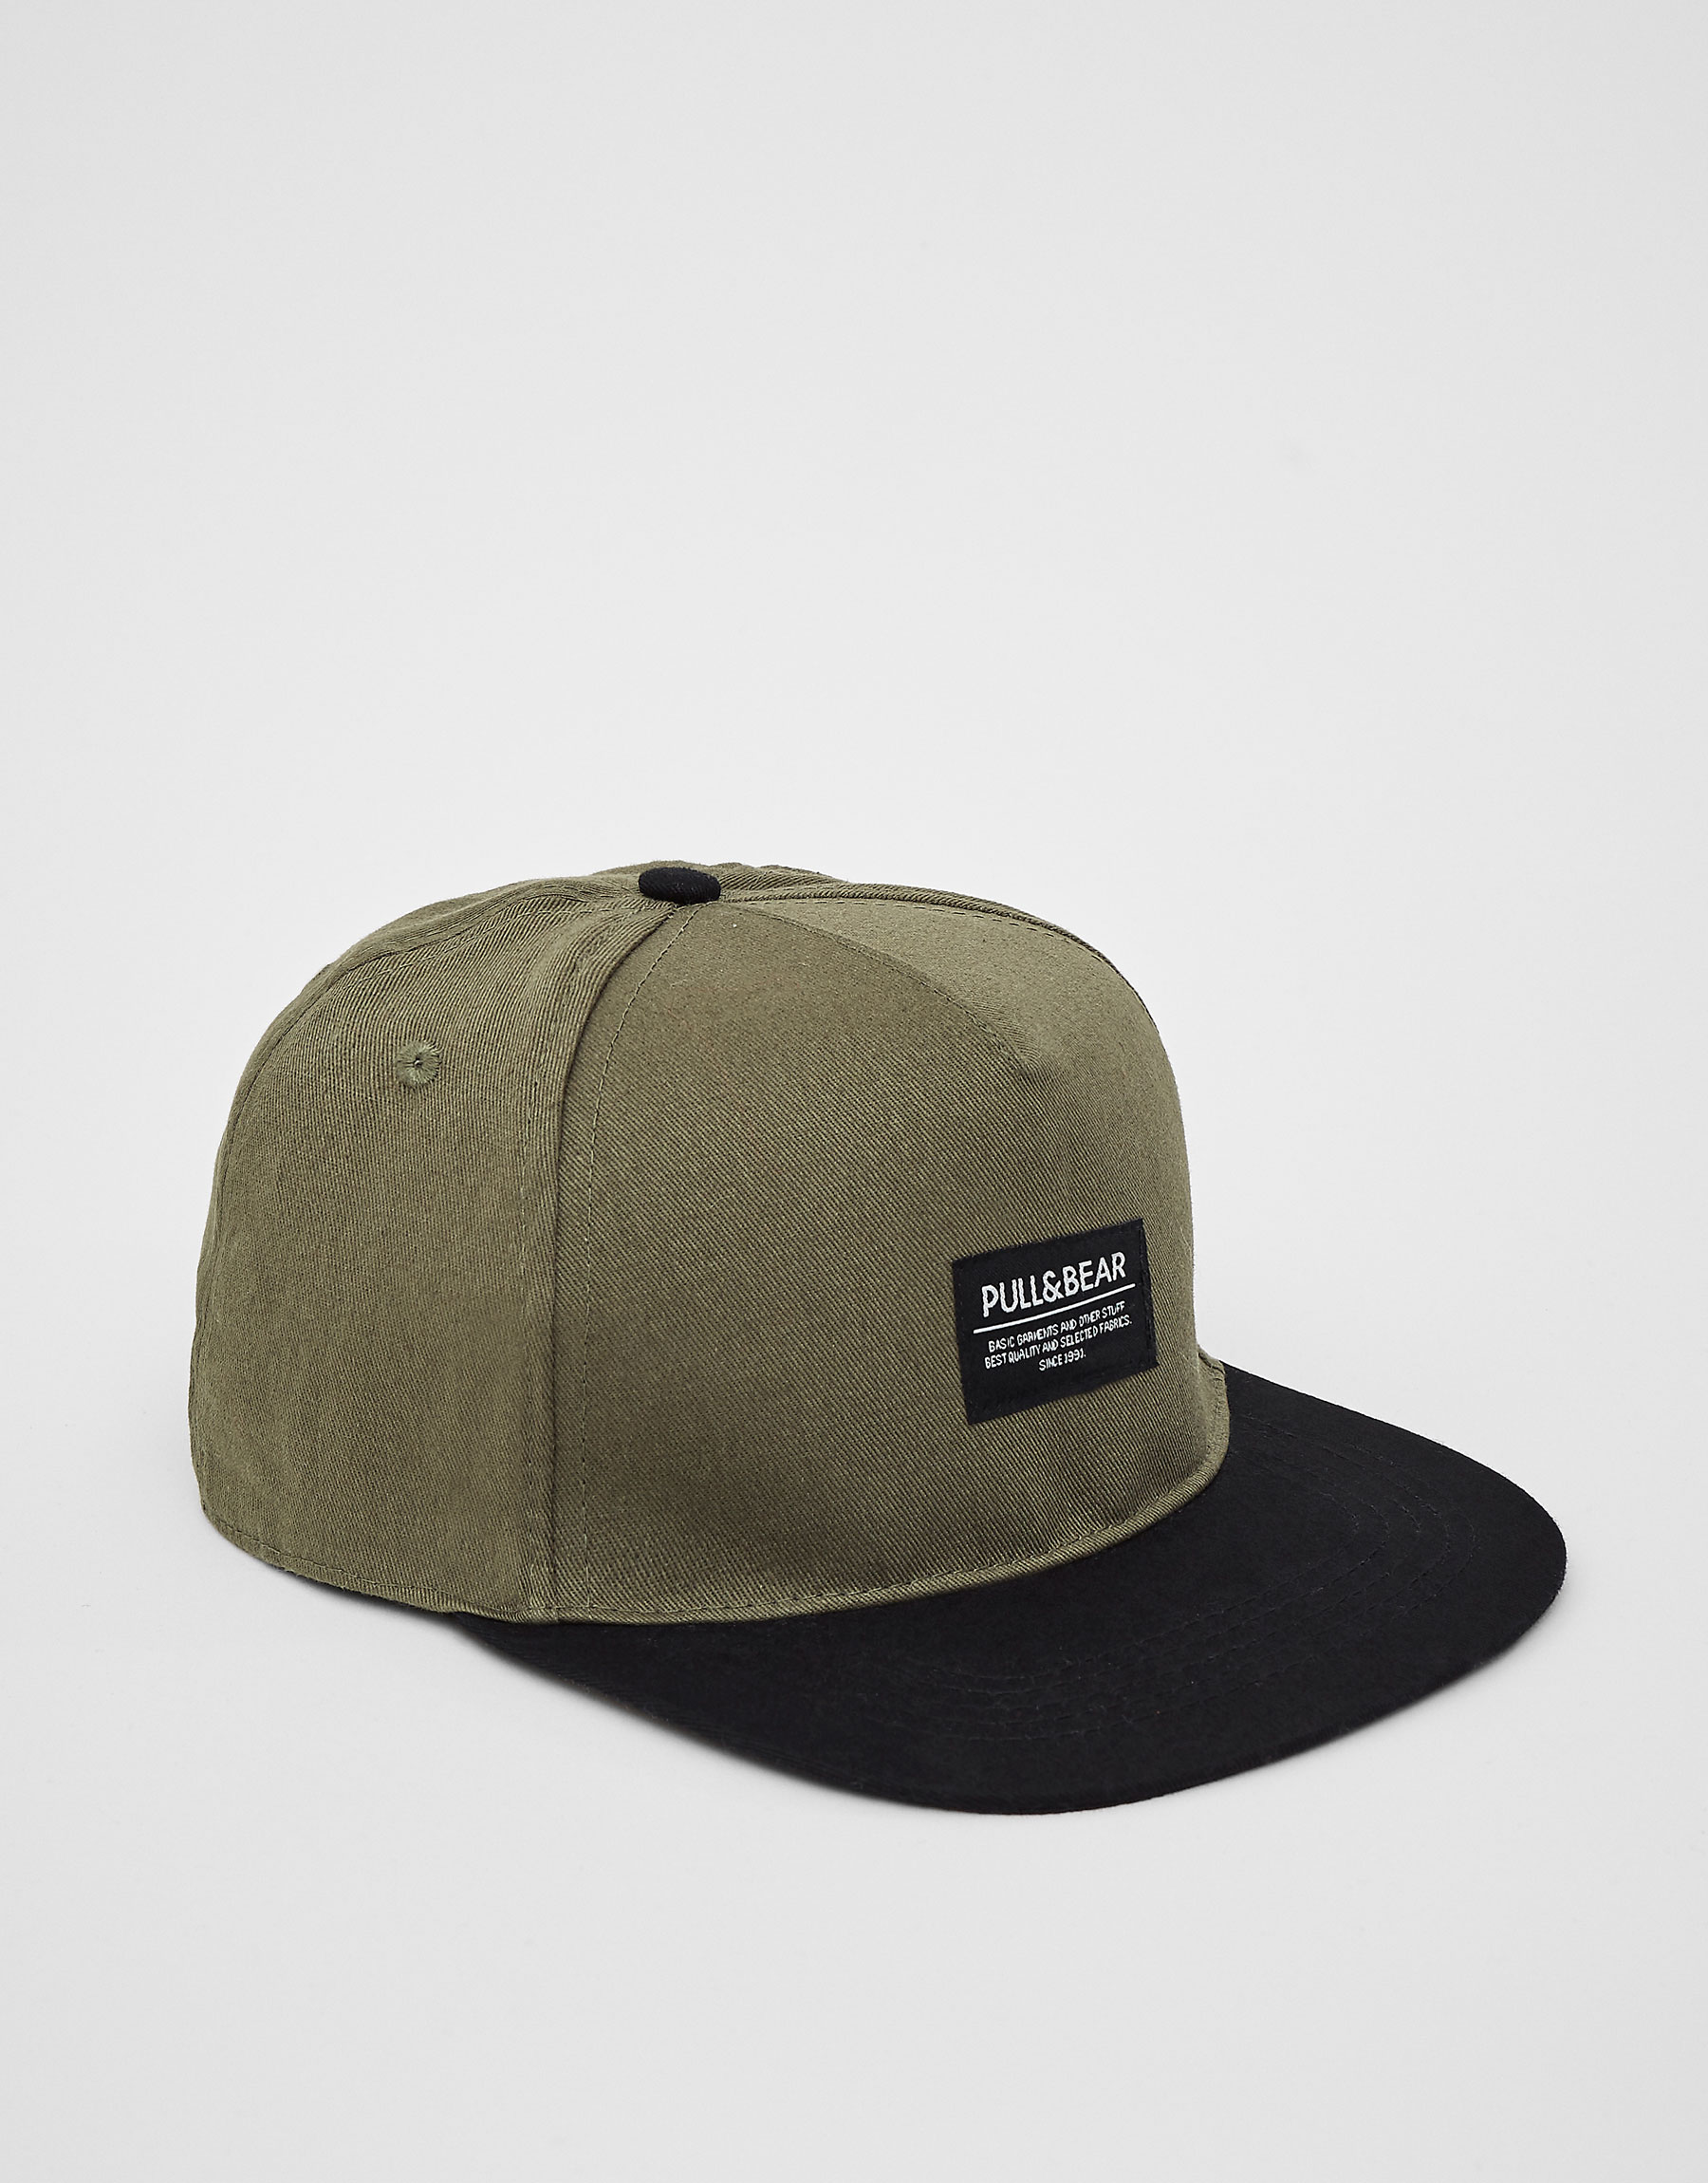 Gorra caqui viseira negra